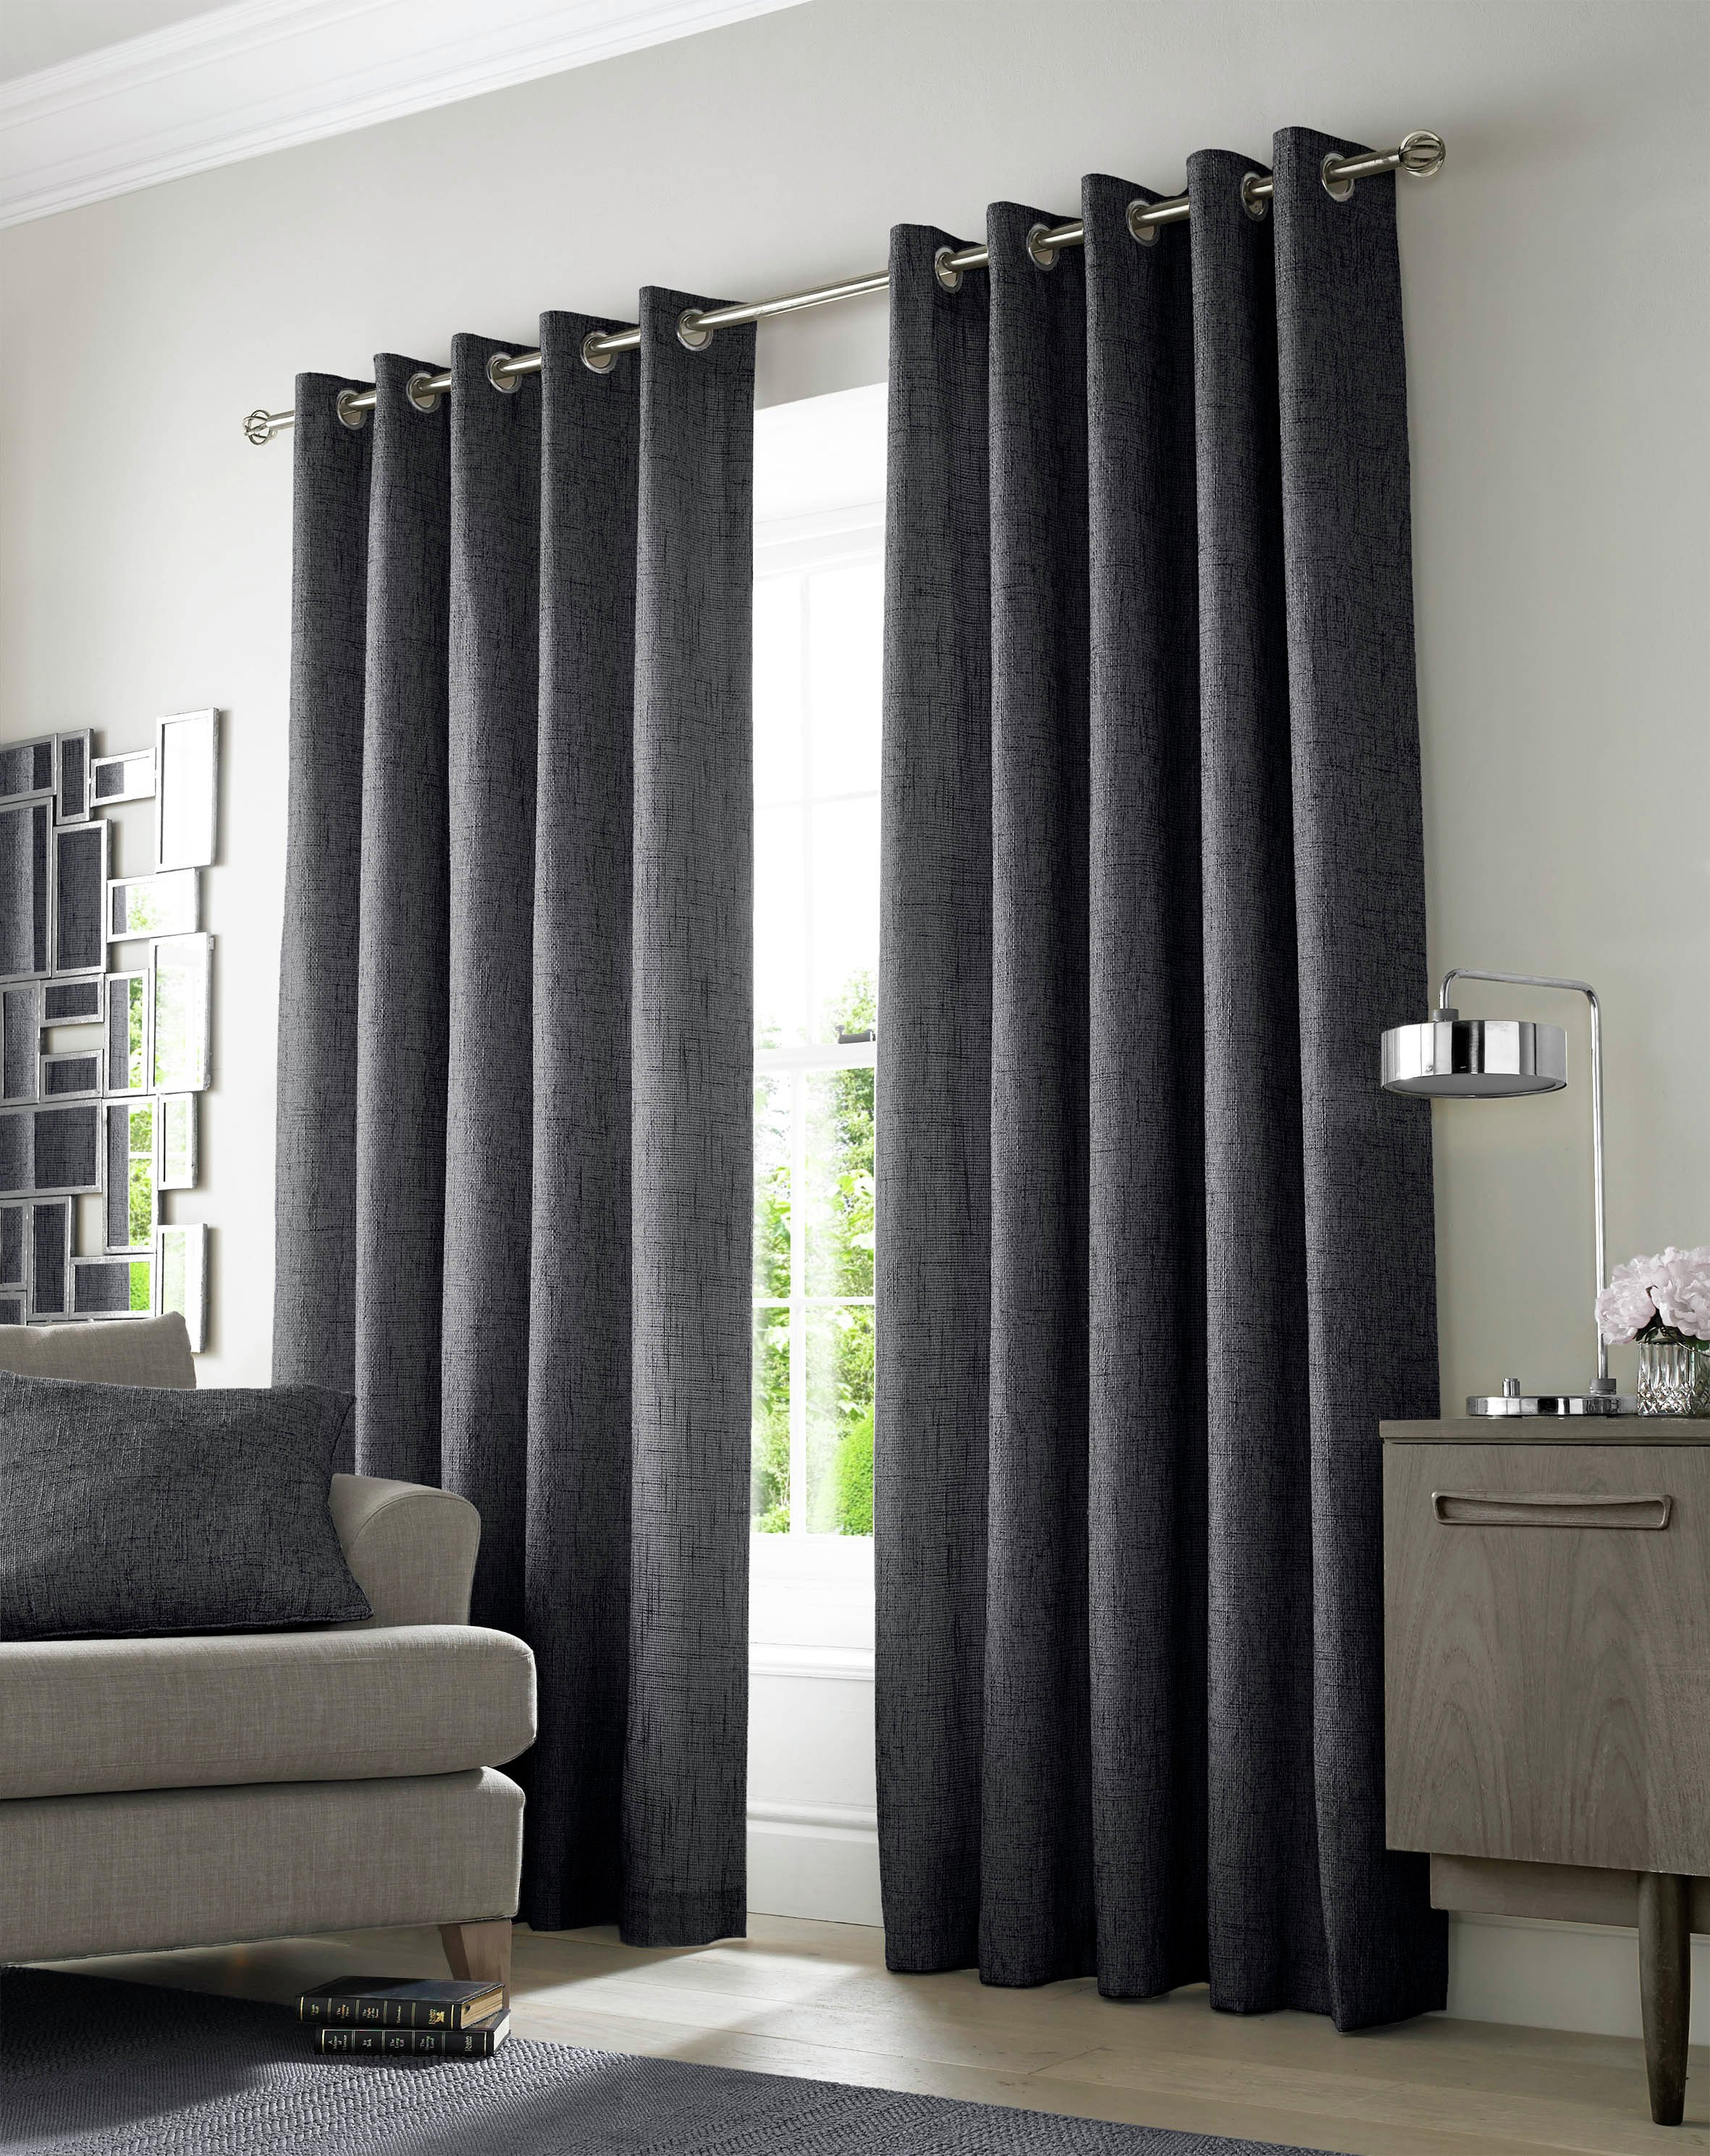 Academy Eyelet Curtains - 165x229cm - Charcoal.